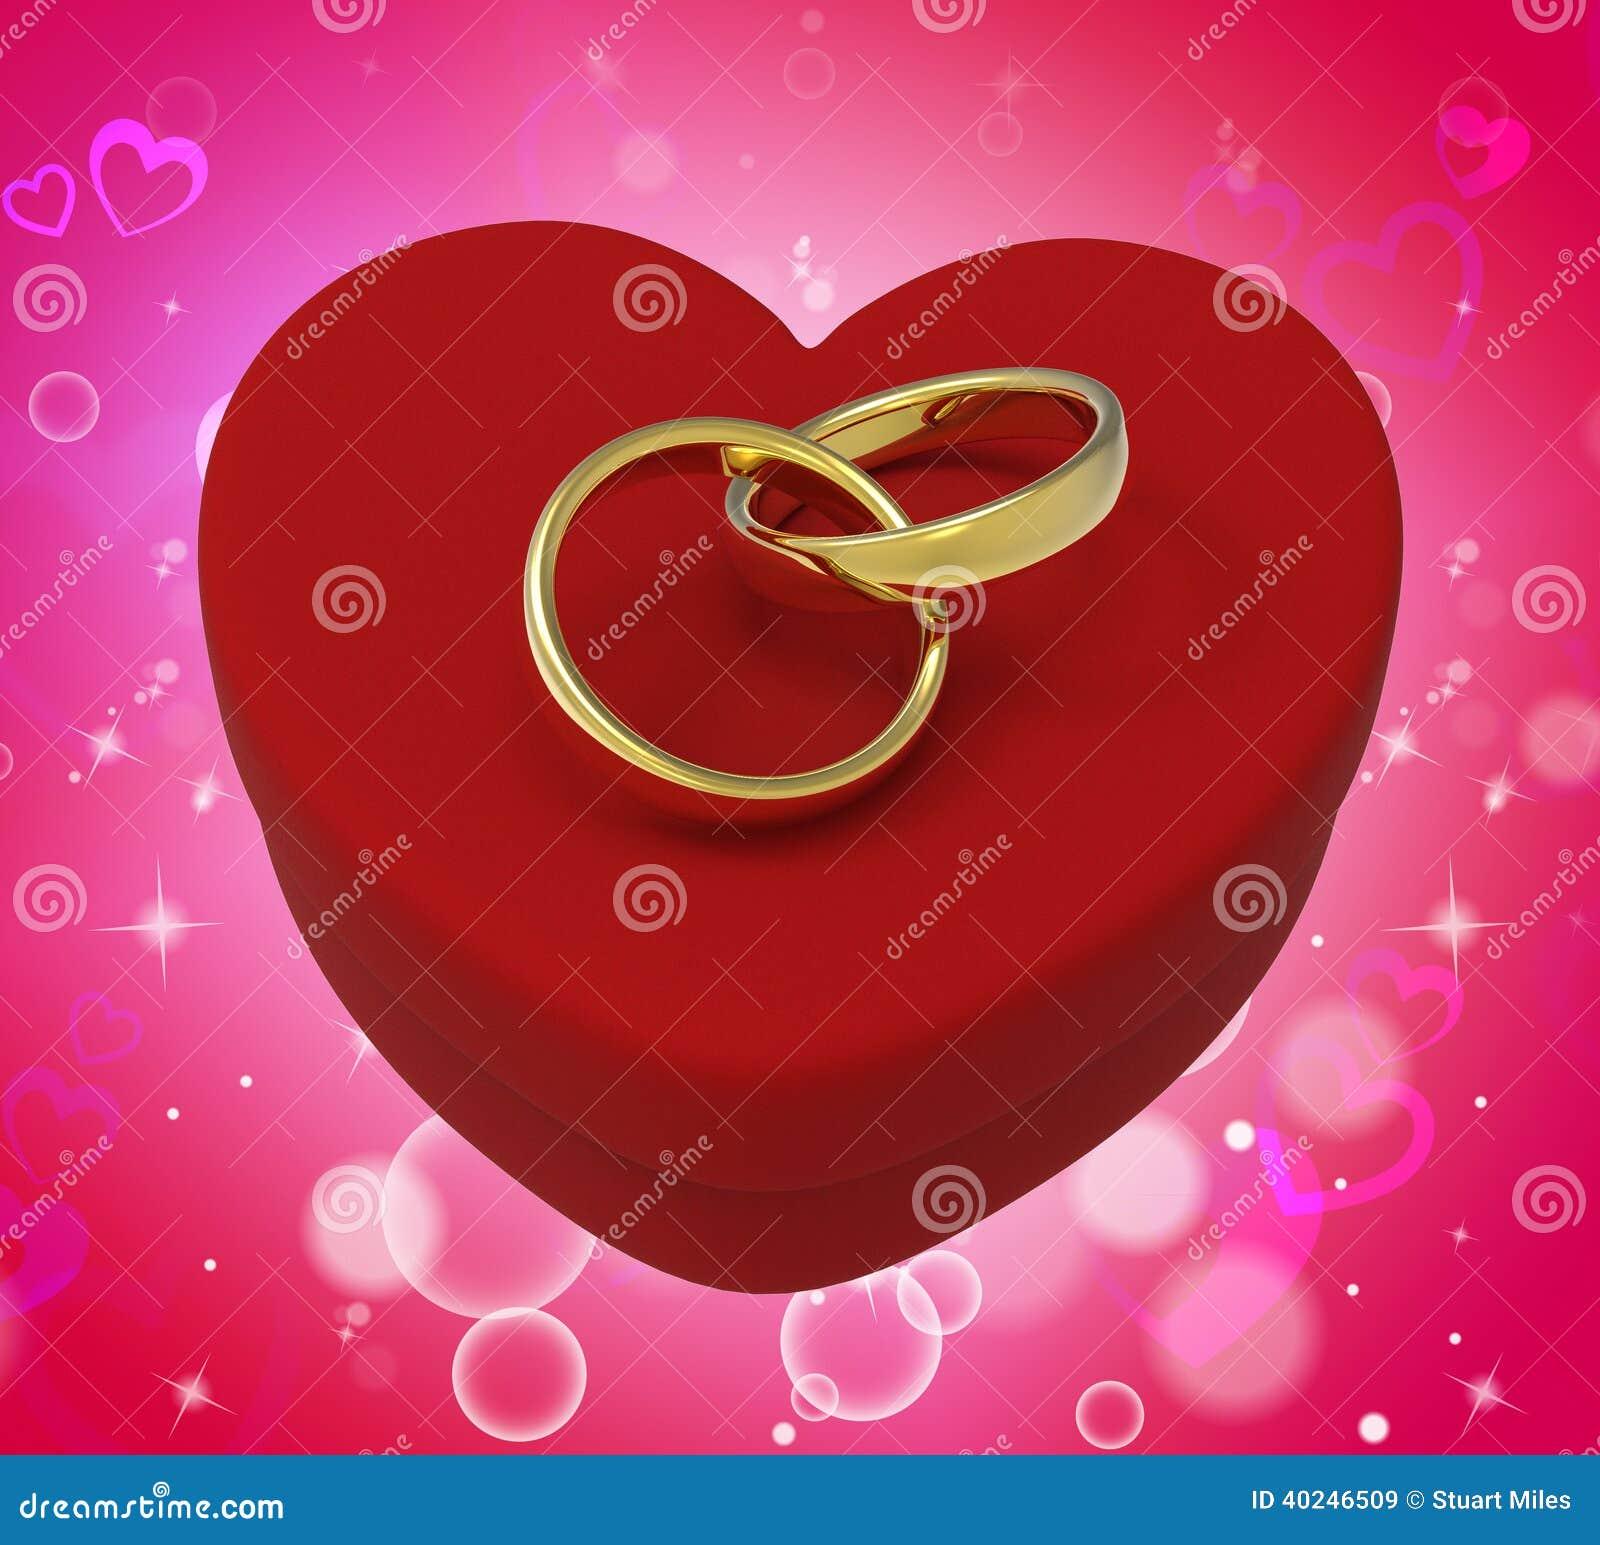 Wedding Rings On Heart Box Mean Romantic Stock ...